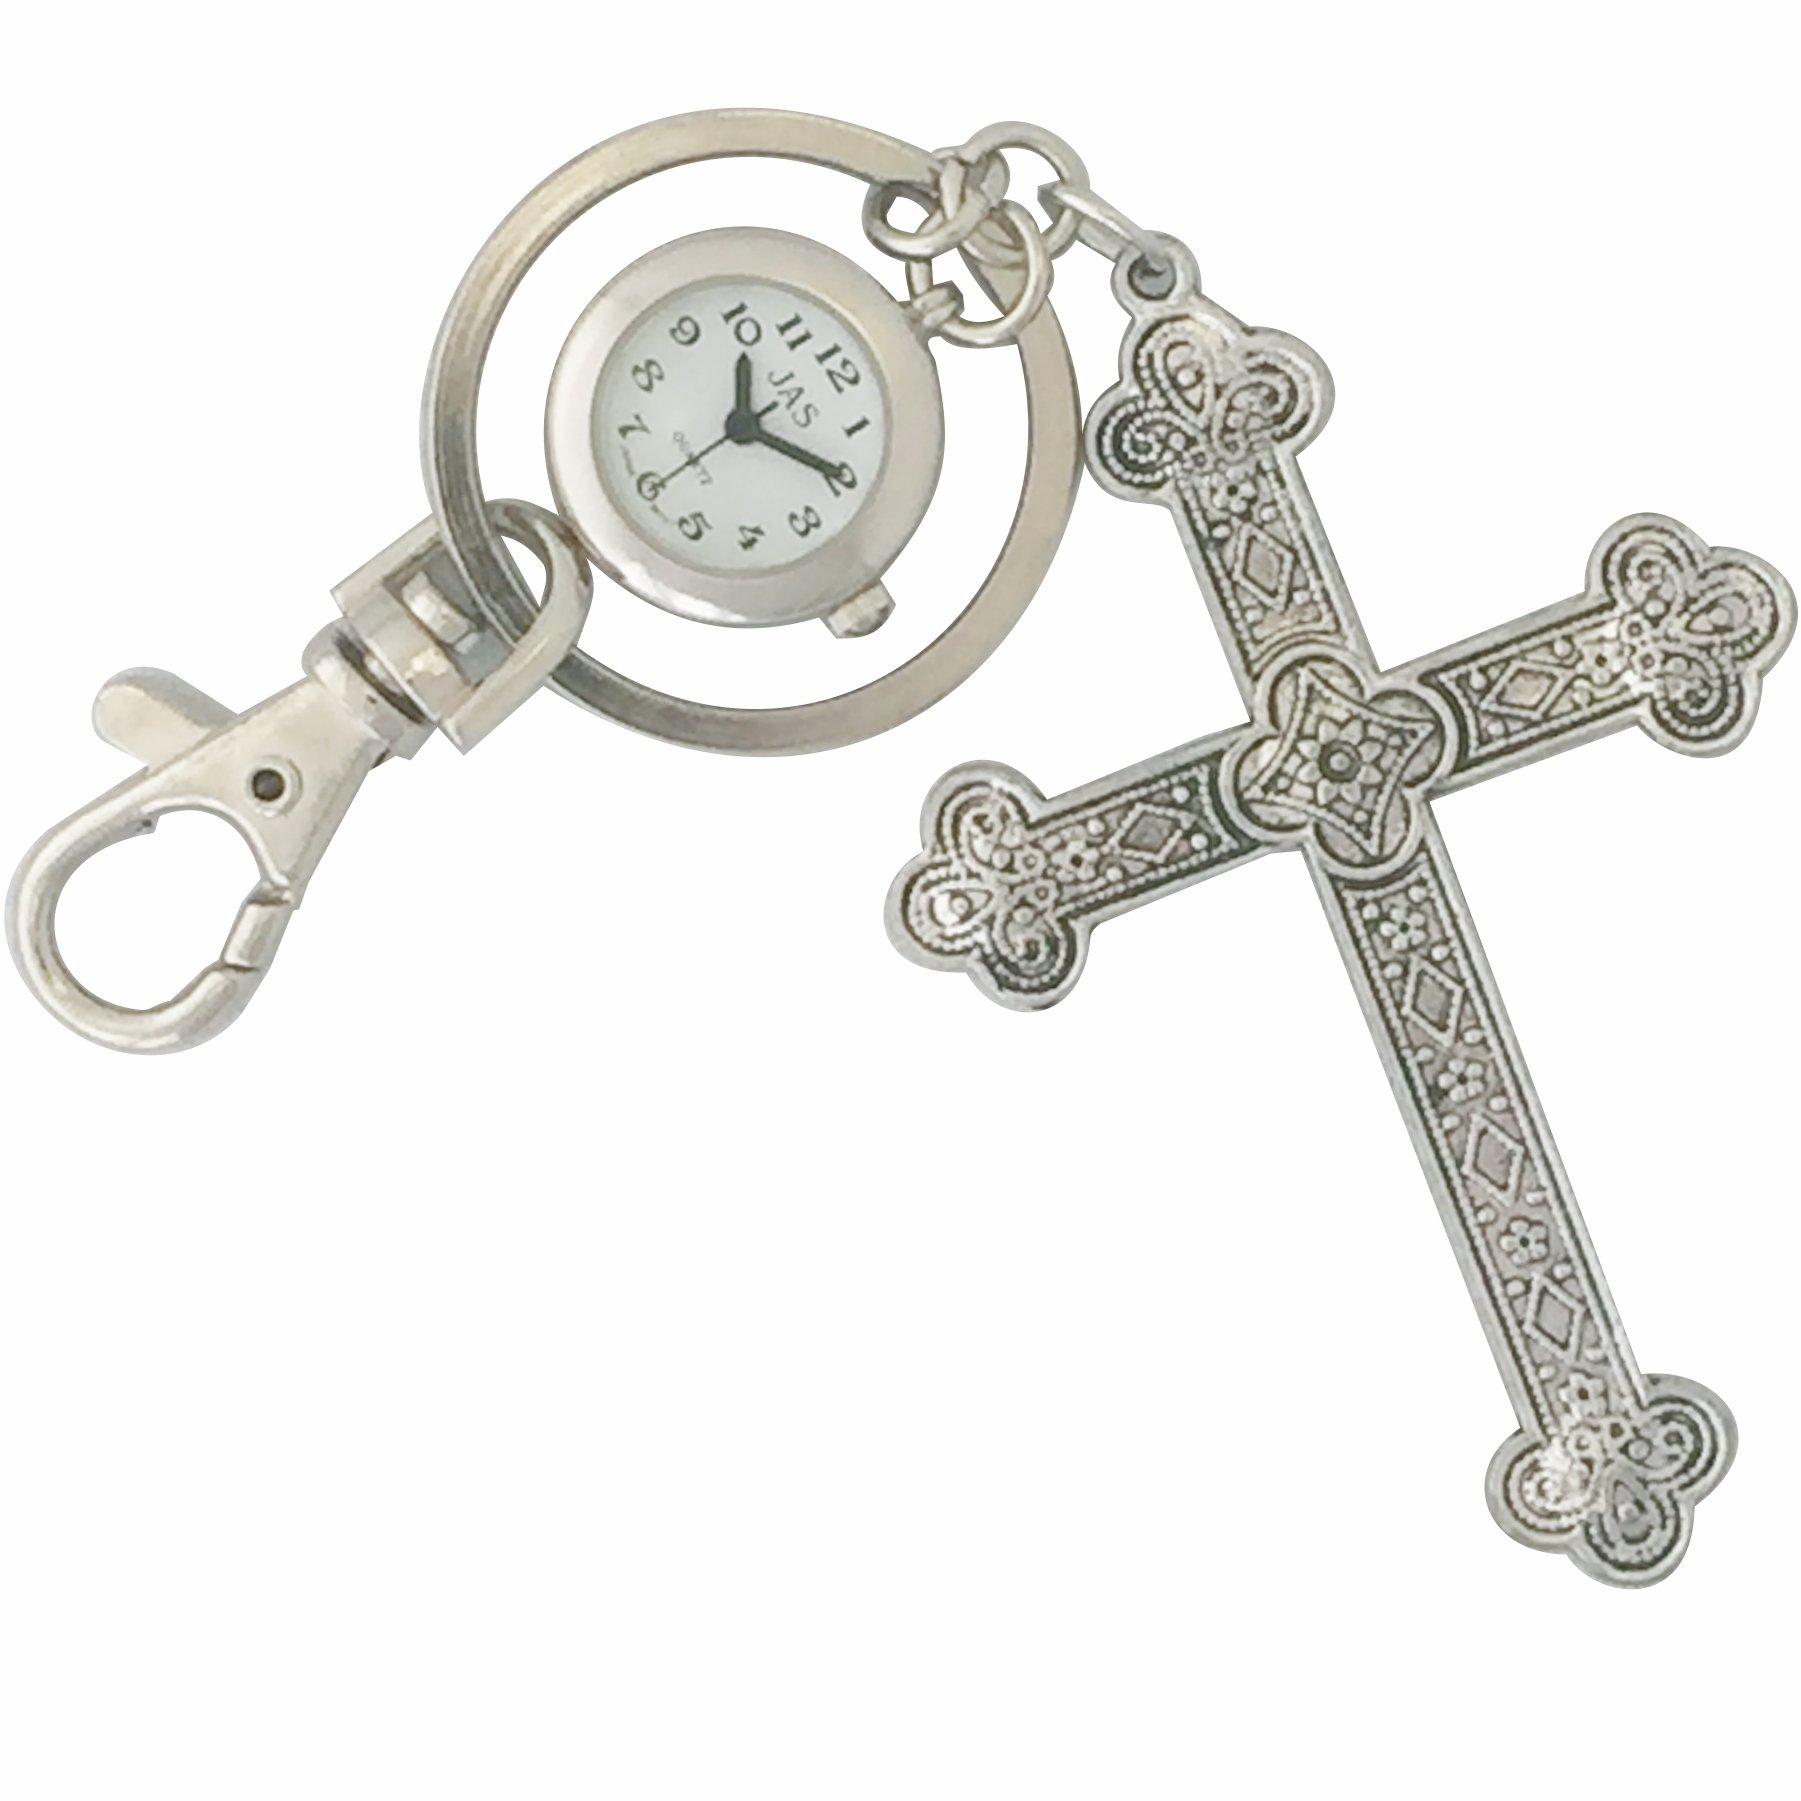 Keychain / Charm Watch - Silver Cross